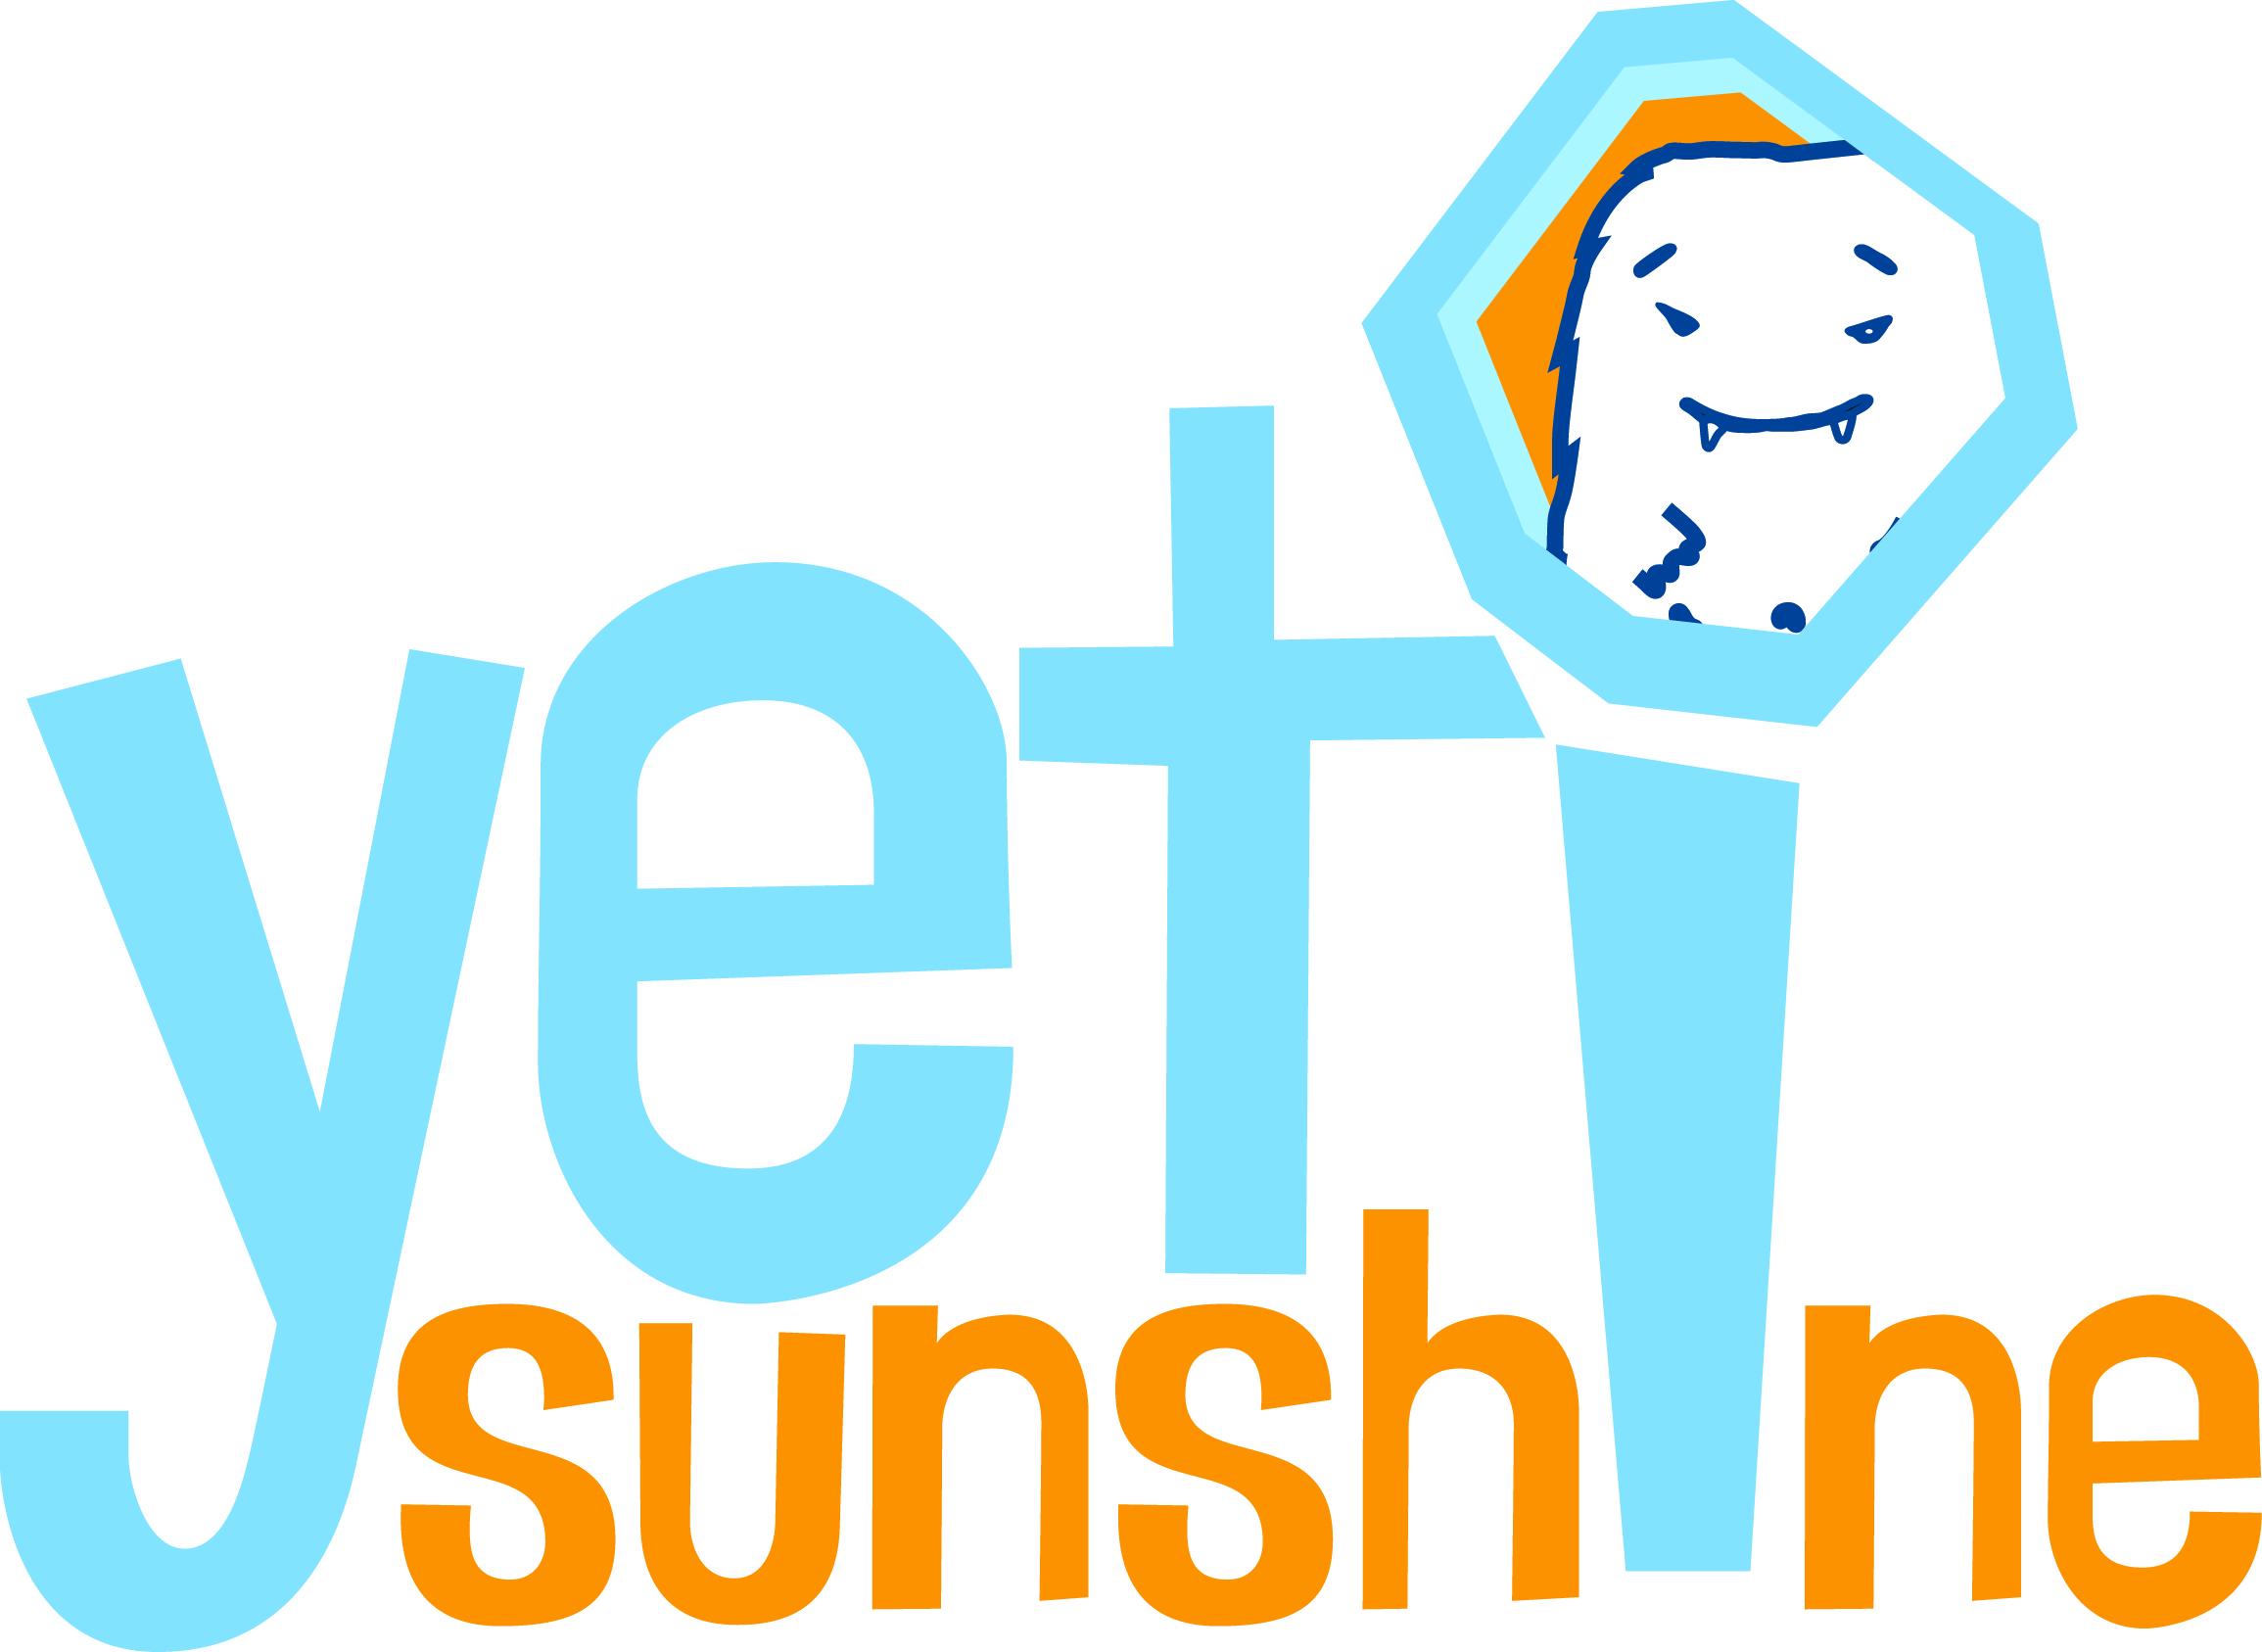 Yeti Sunshine